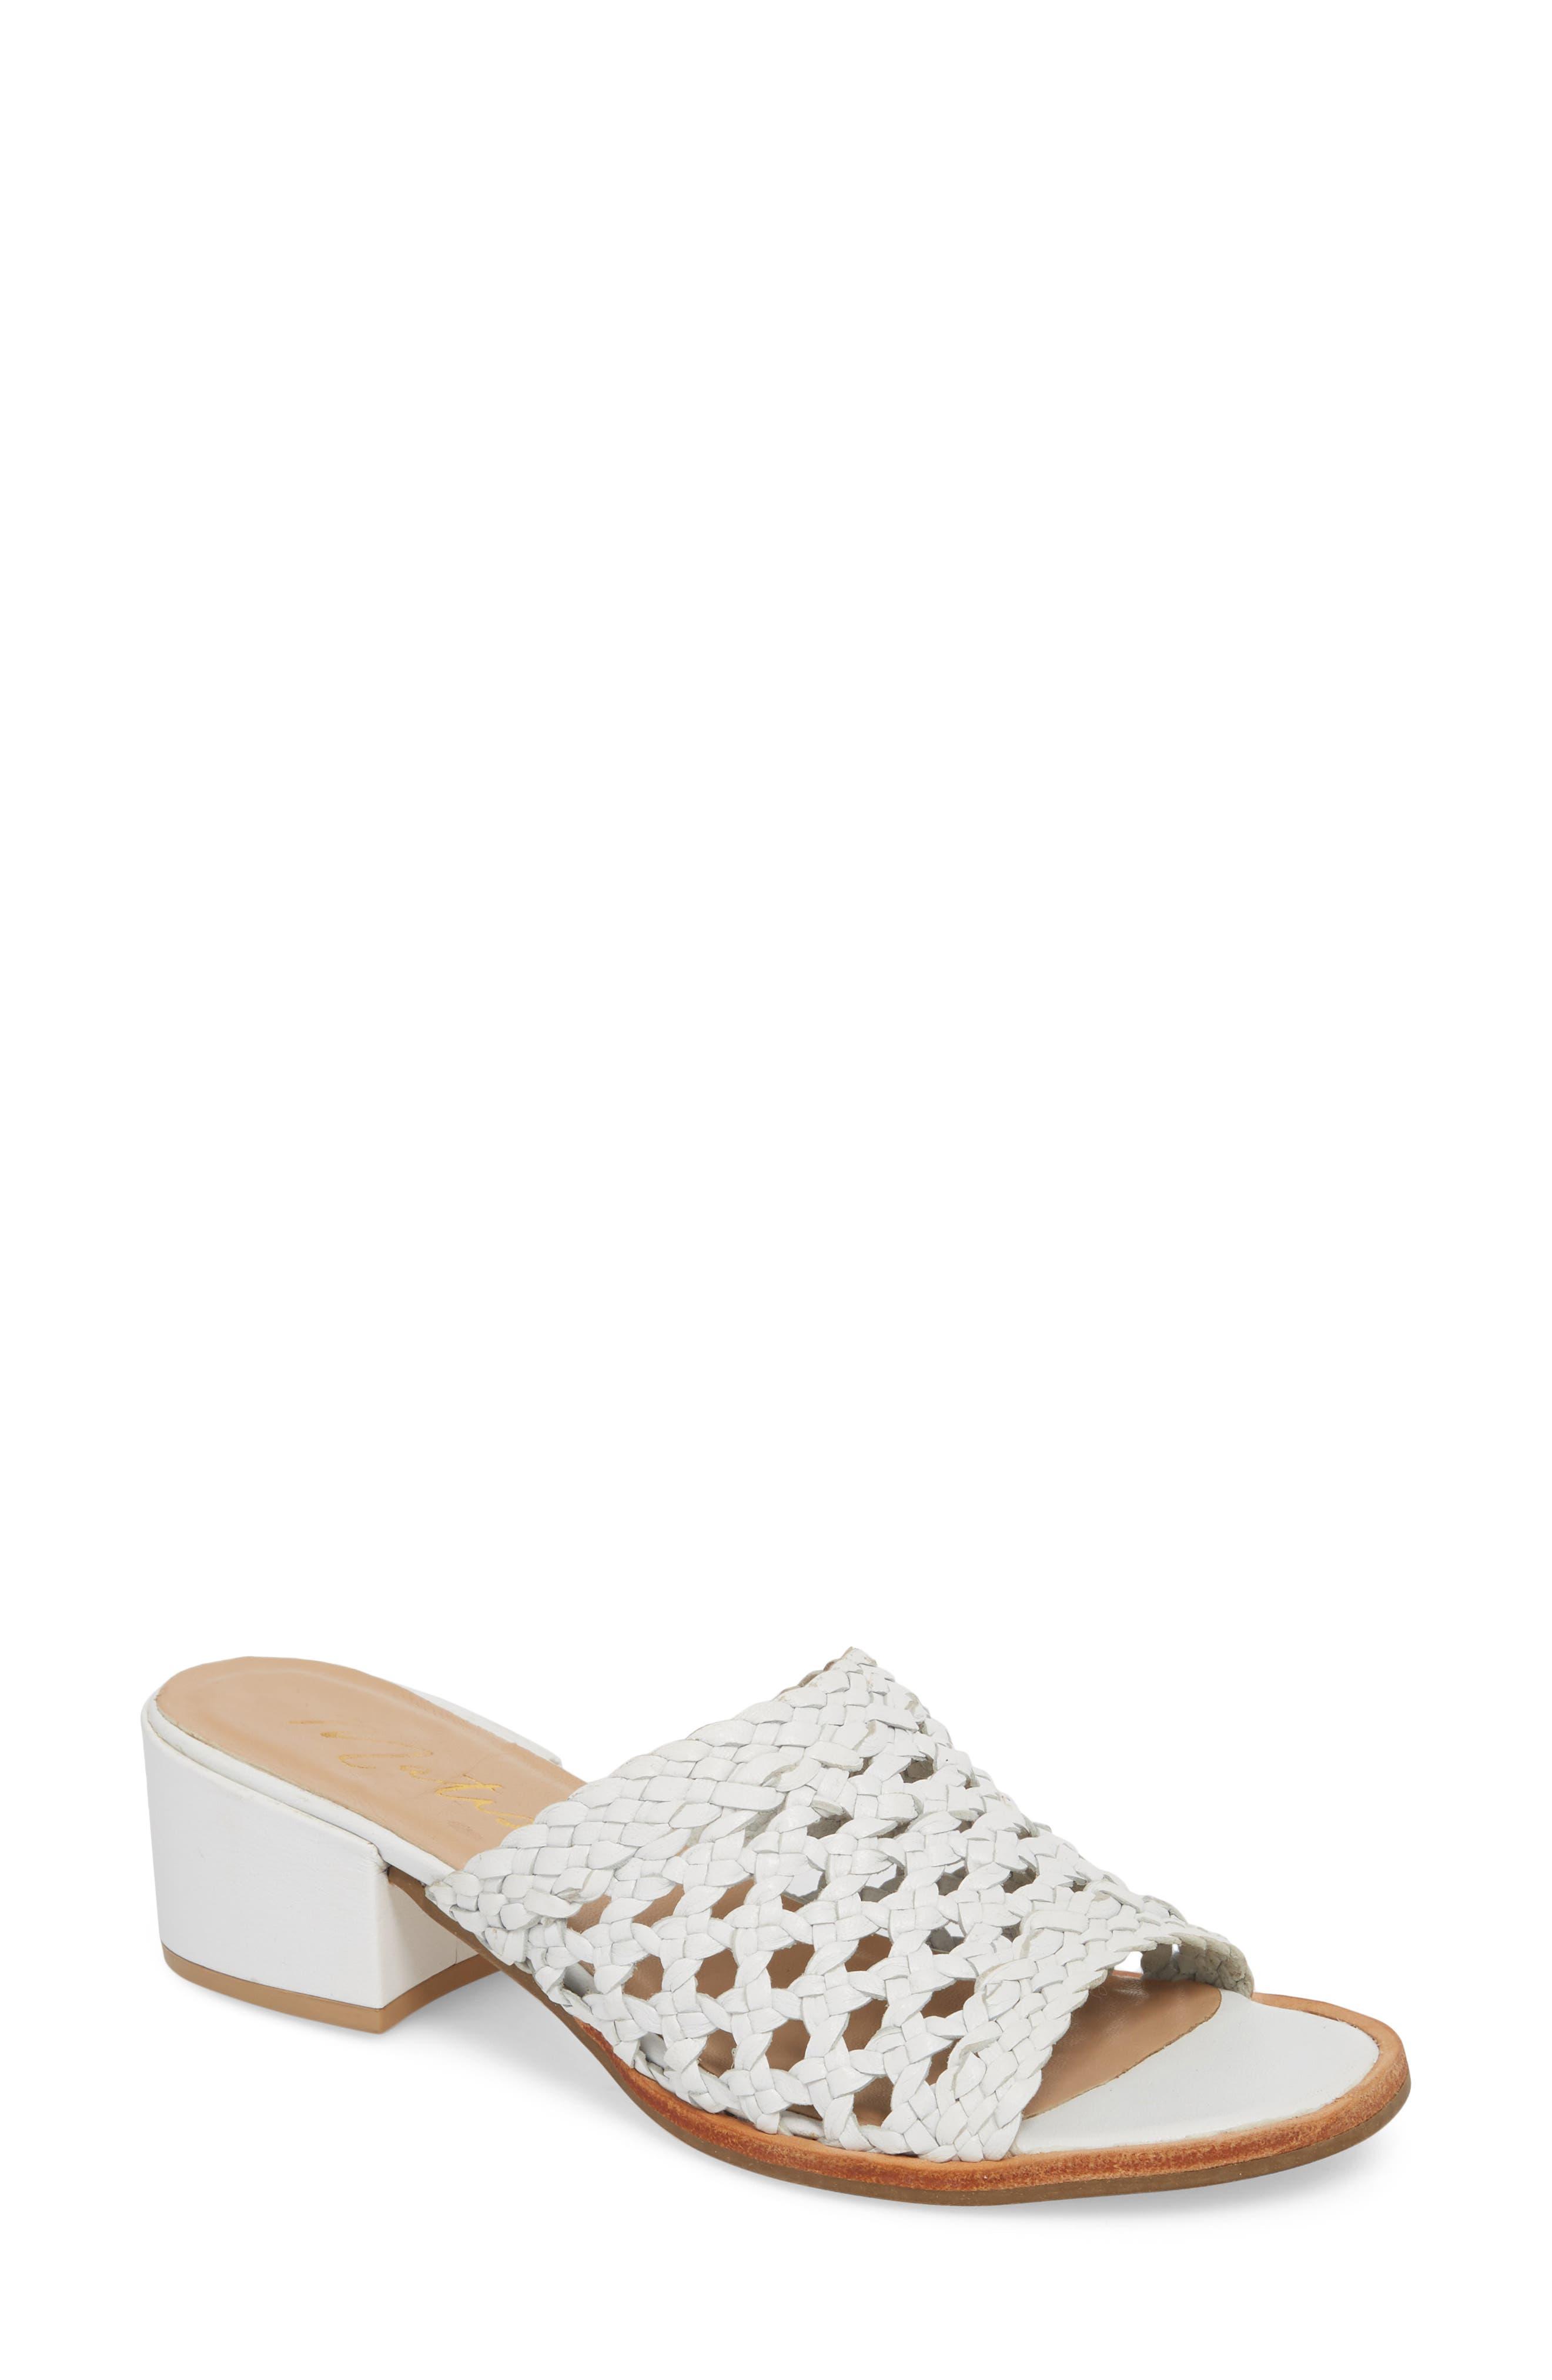 Ditsy Slide Sandal,                             Main thumbnail 1, color,                             White Leather